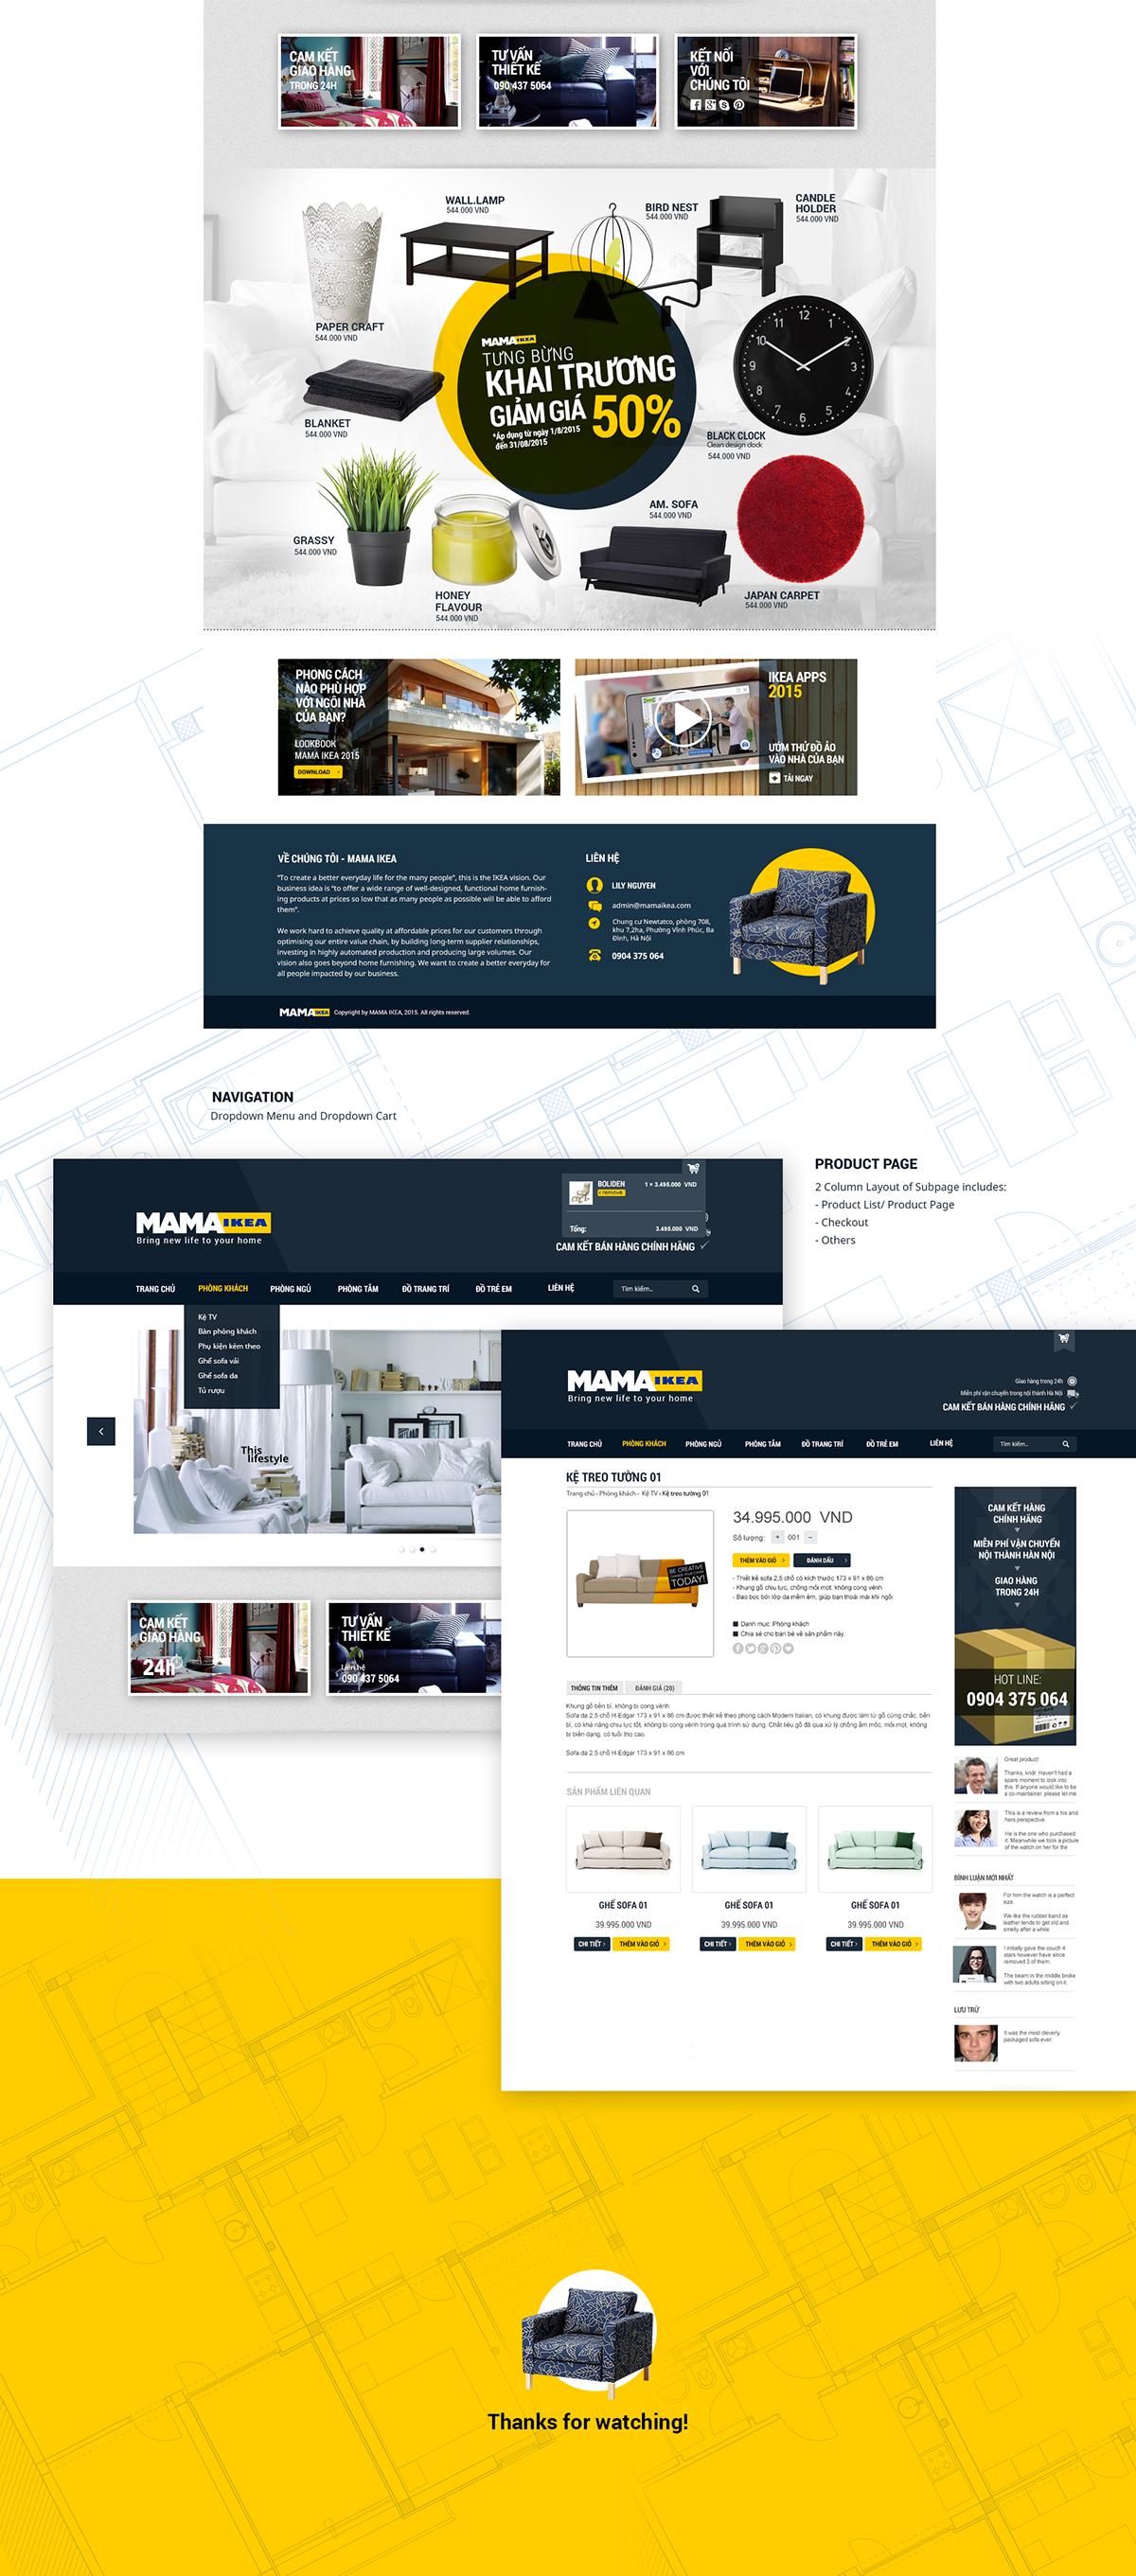 MAMA IKEA - Website Layout Design on Student Show